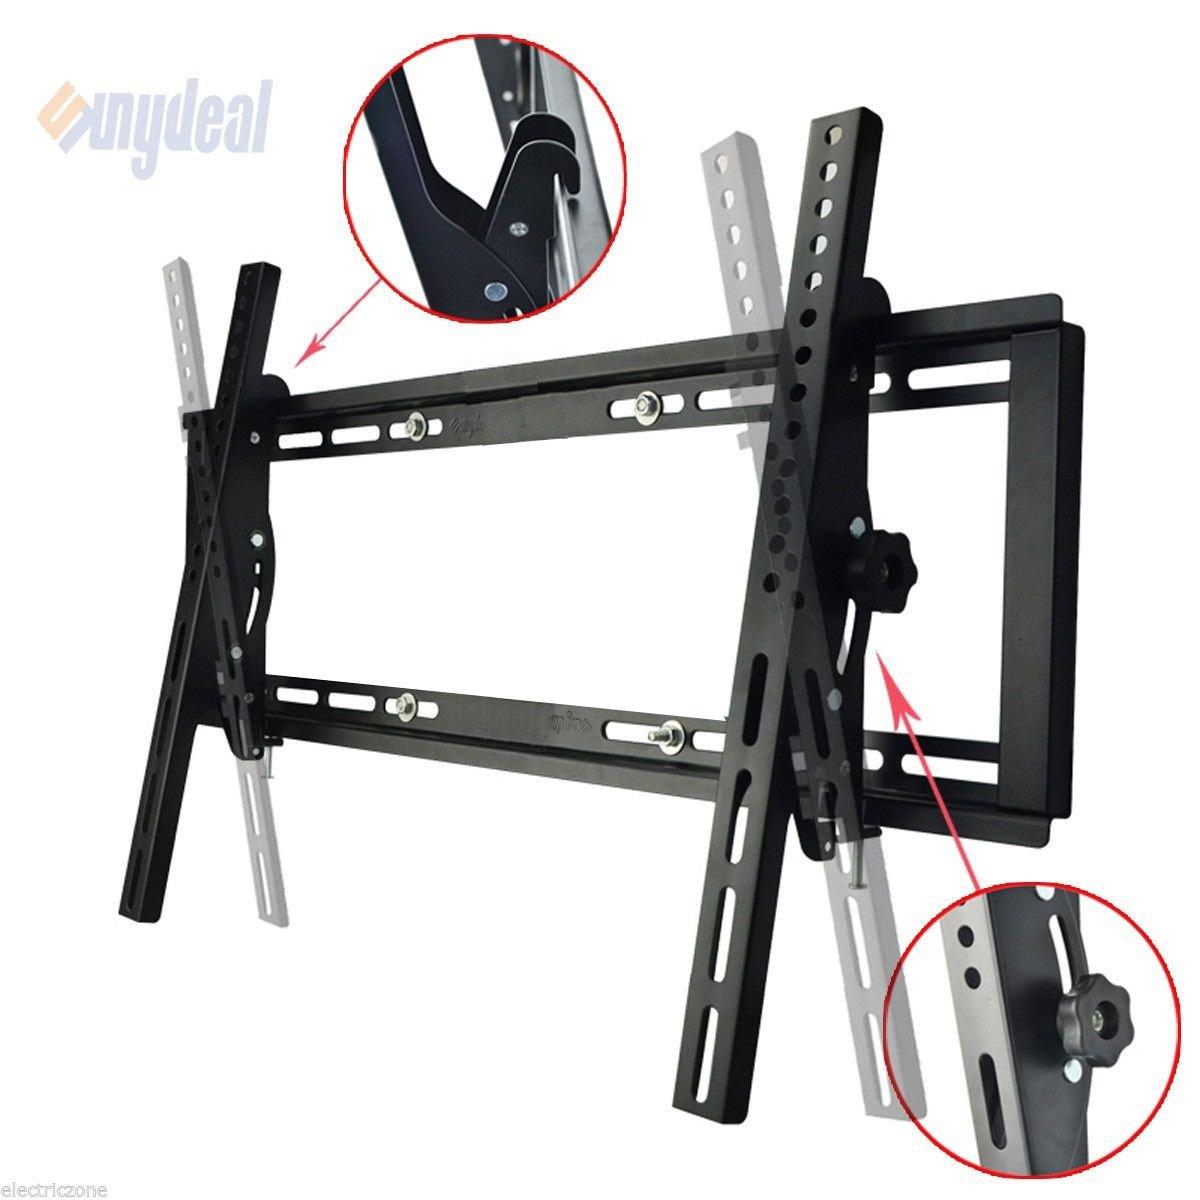 7c6d984666e Sunydeal Tilt TV Wall Mount Bracket for Most 22 - 65 inch Vizio Samsung  Sony LG TCL Sharp AQUOS LCD LED Plasma TV